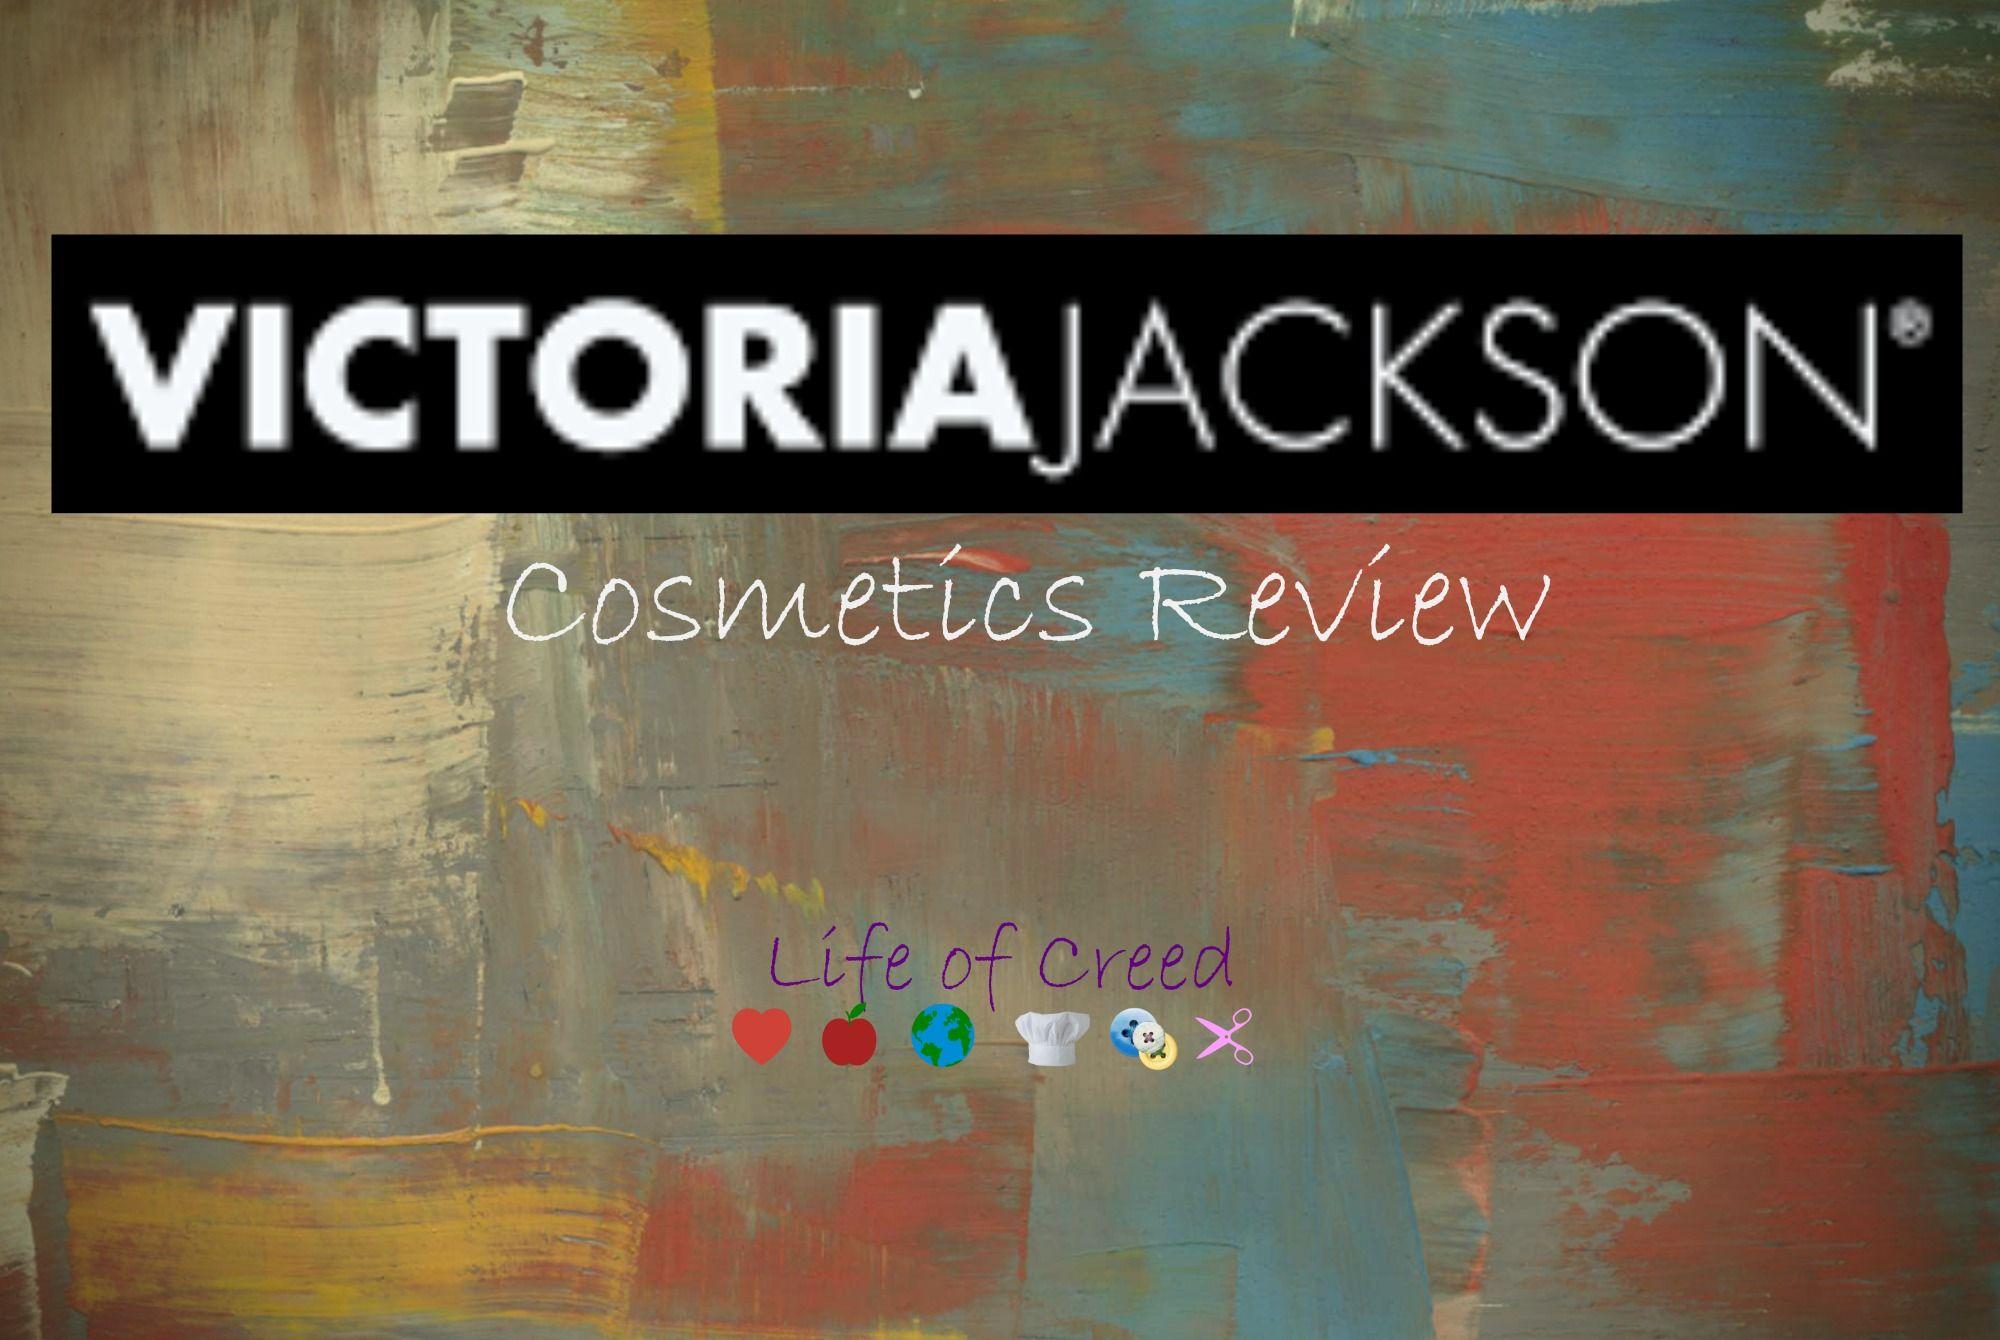 Victoria Jackson Cosmetics Review via LifeofCreed